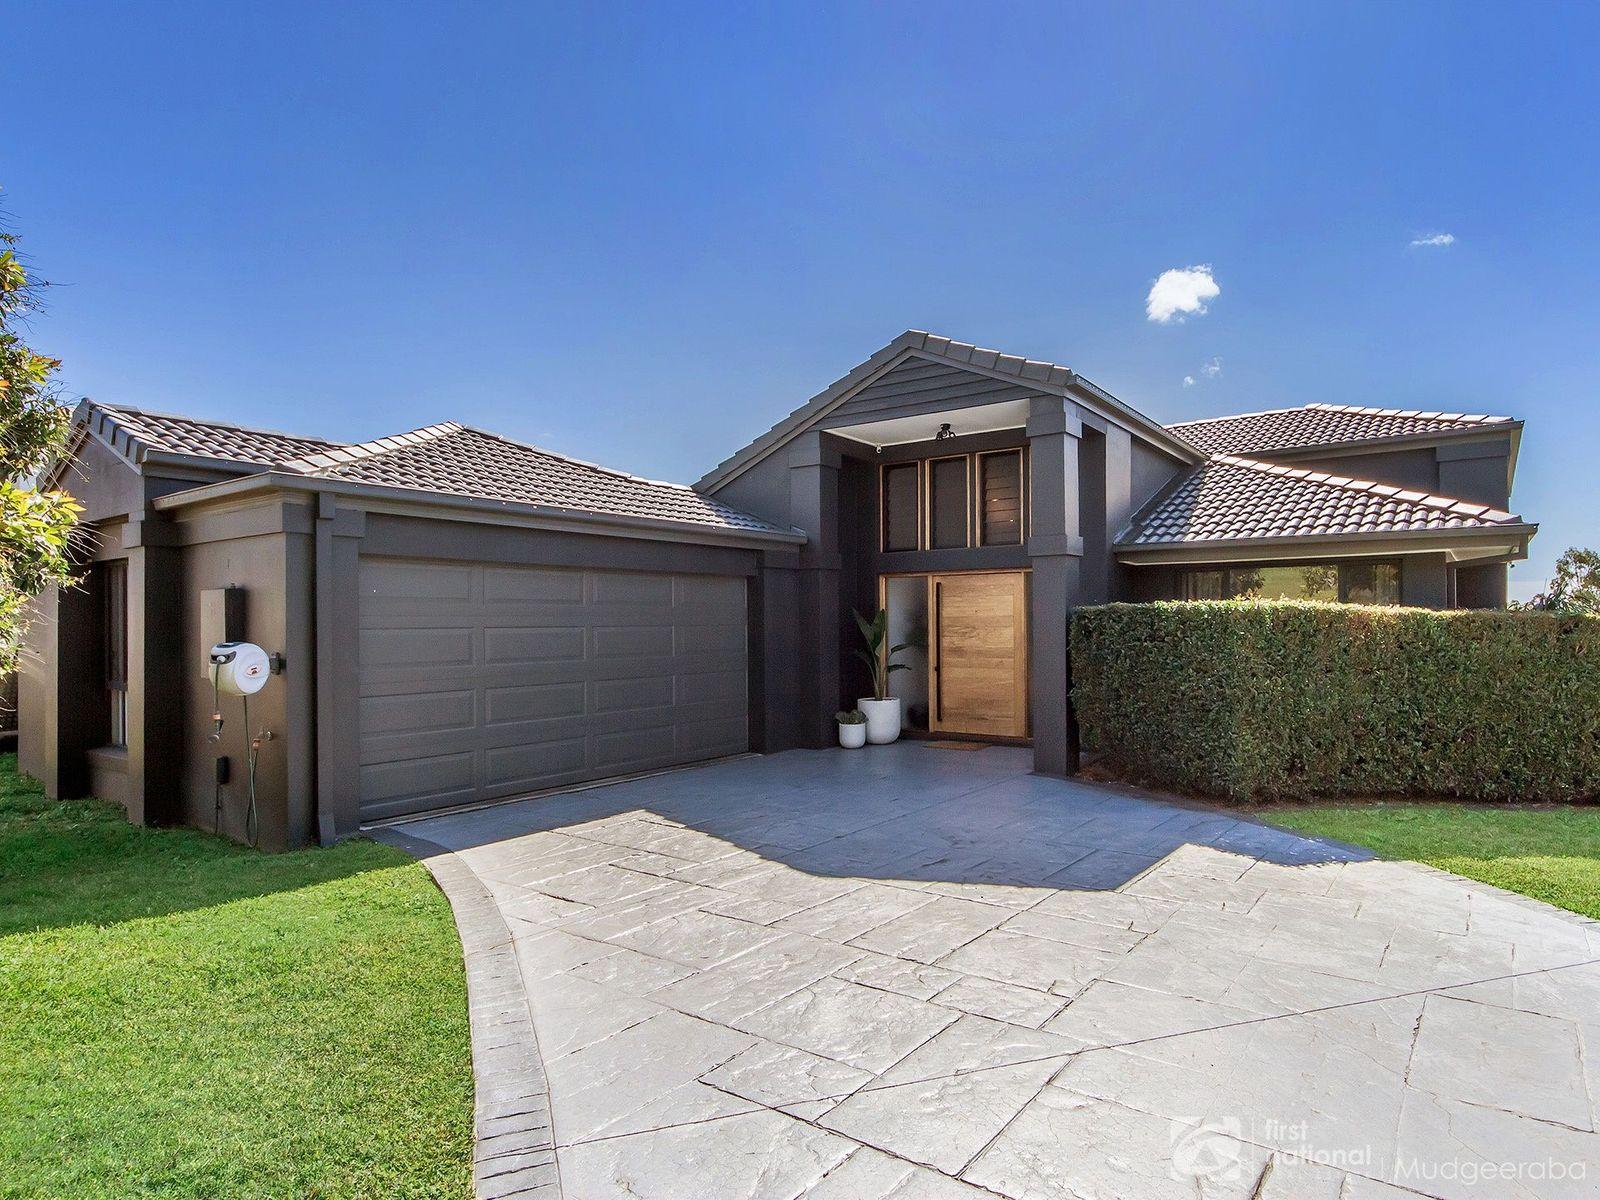 21 Faculty Crescent, Mudgeeraba, QLD 4213